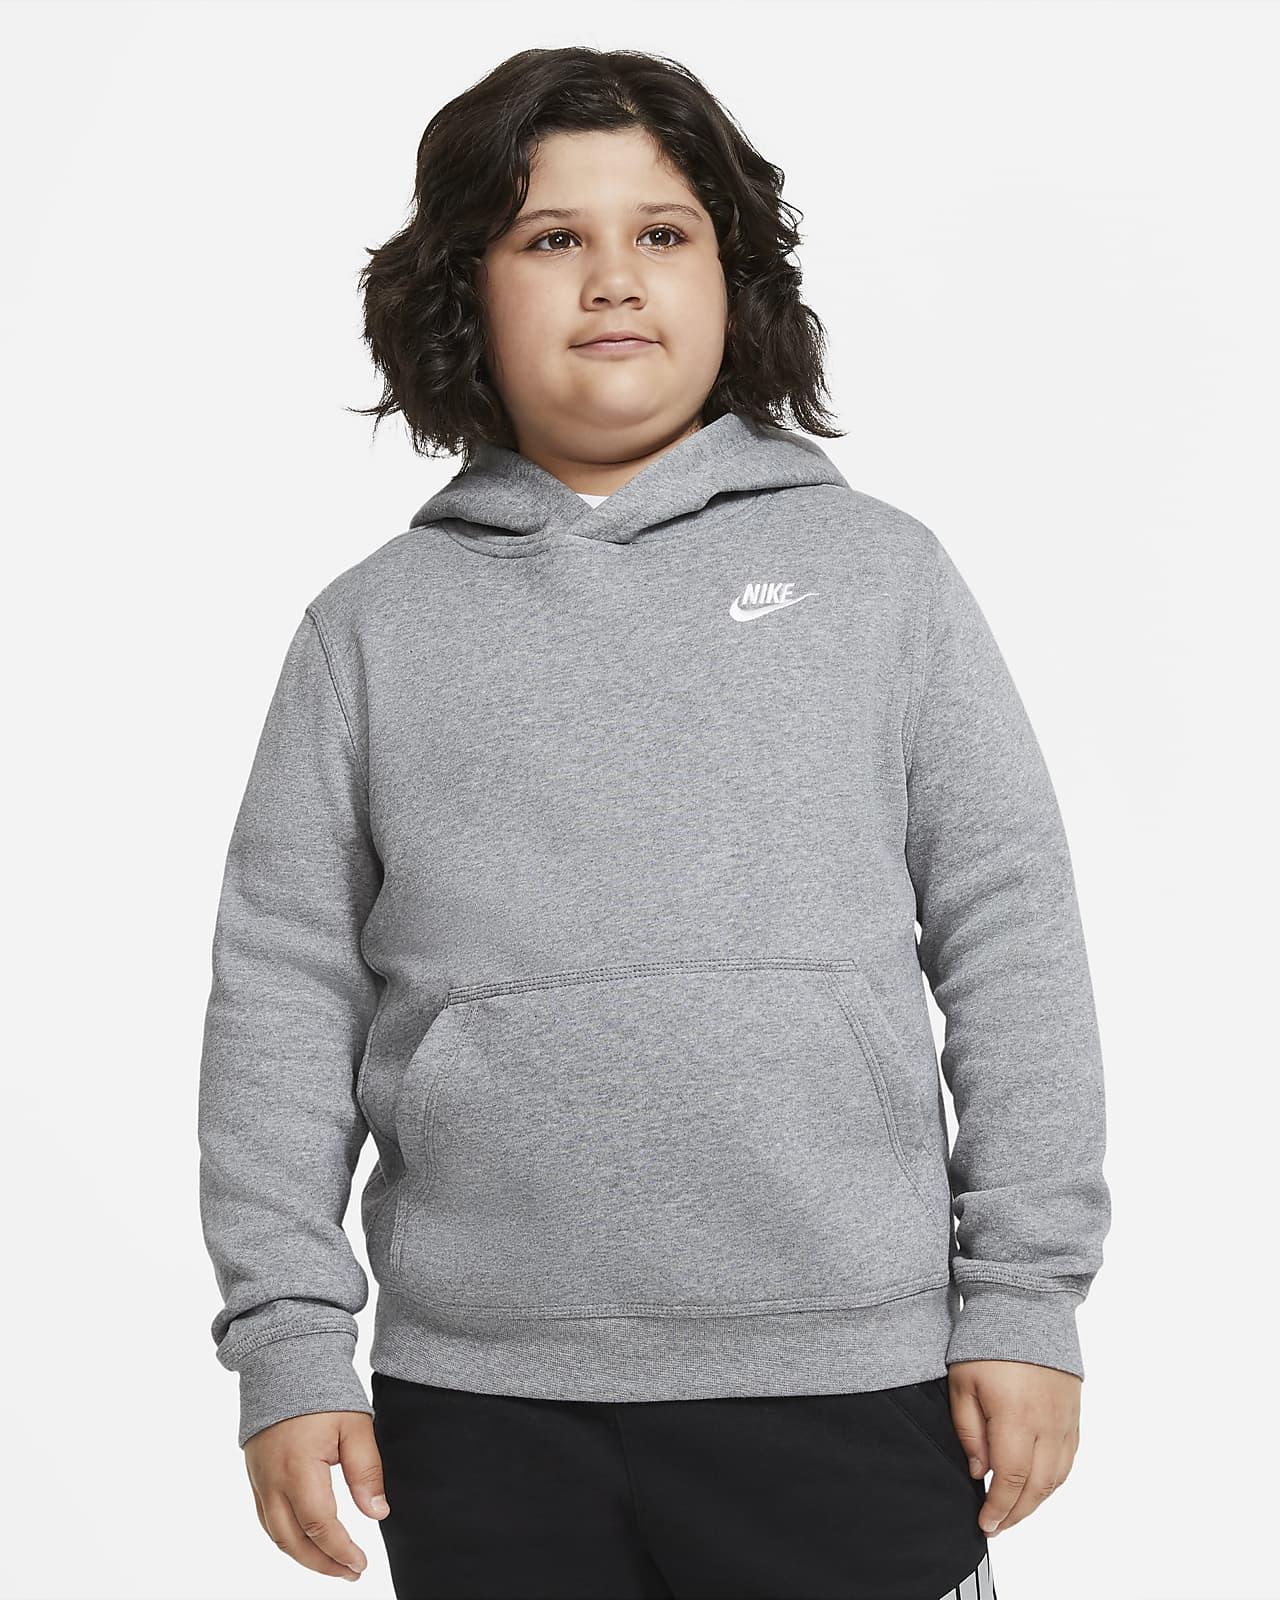 Sweat à capuche Nike Sportswear Club Fleece pour Garçon plus âgé (grande taille)